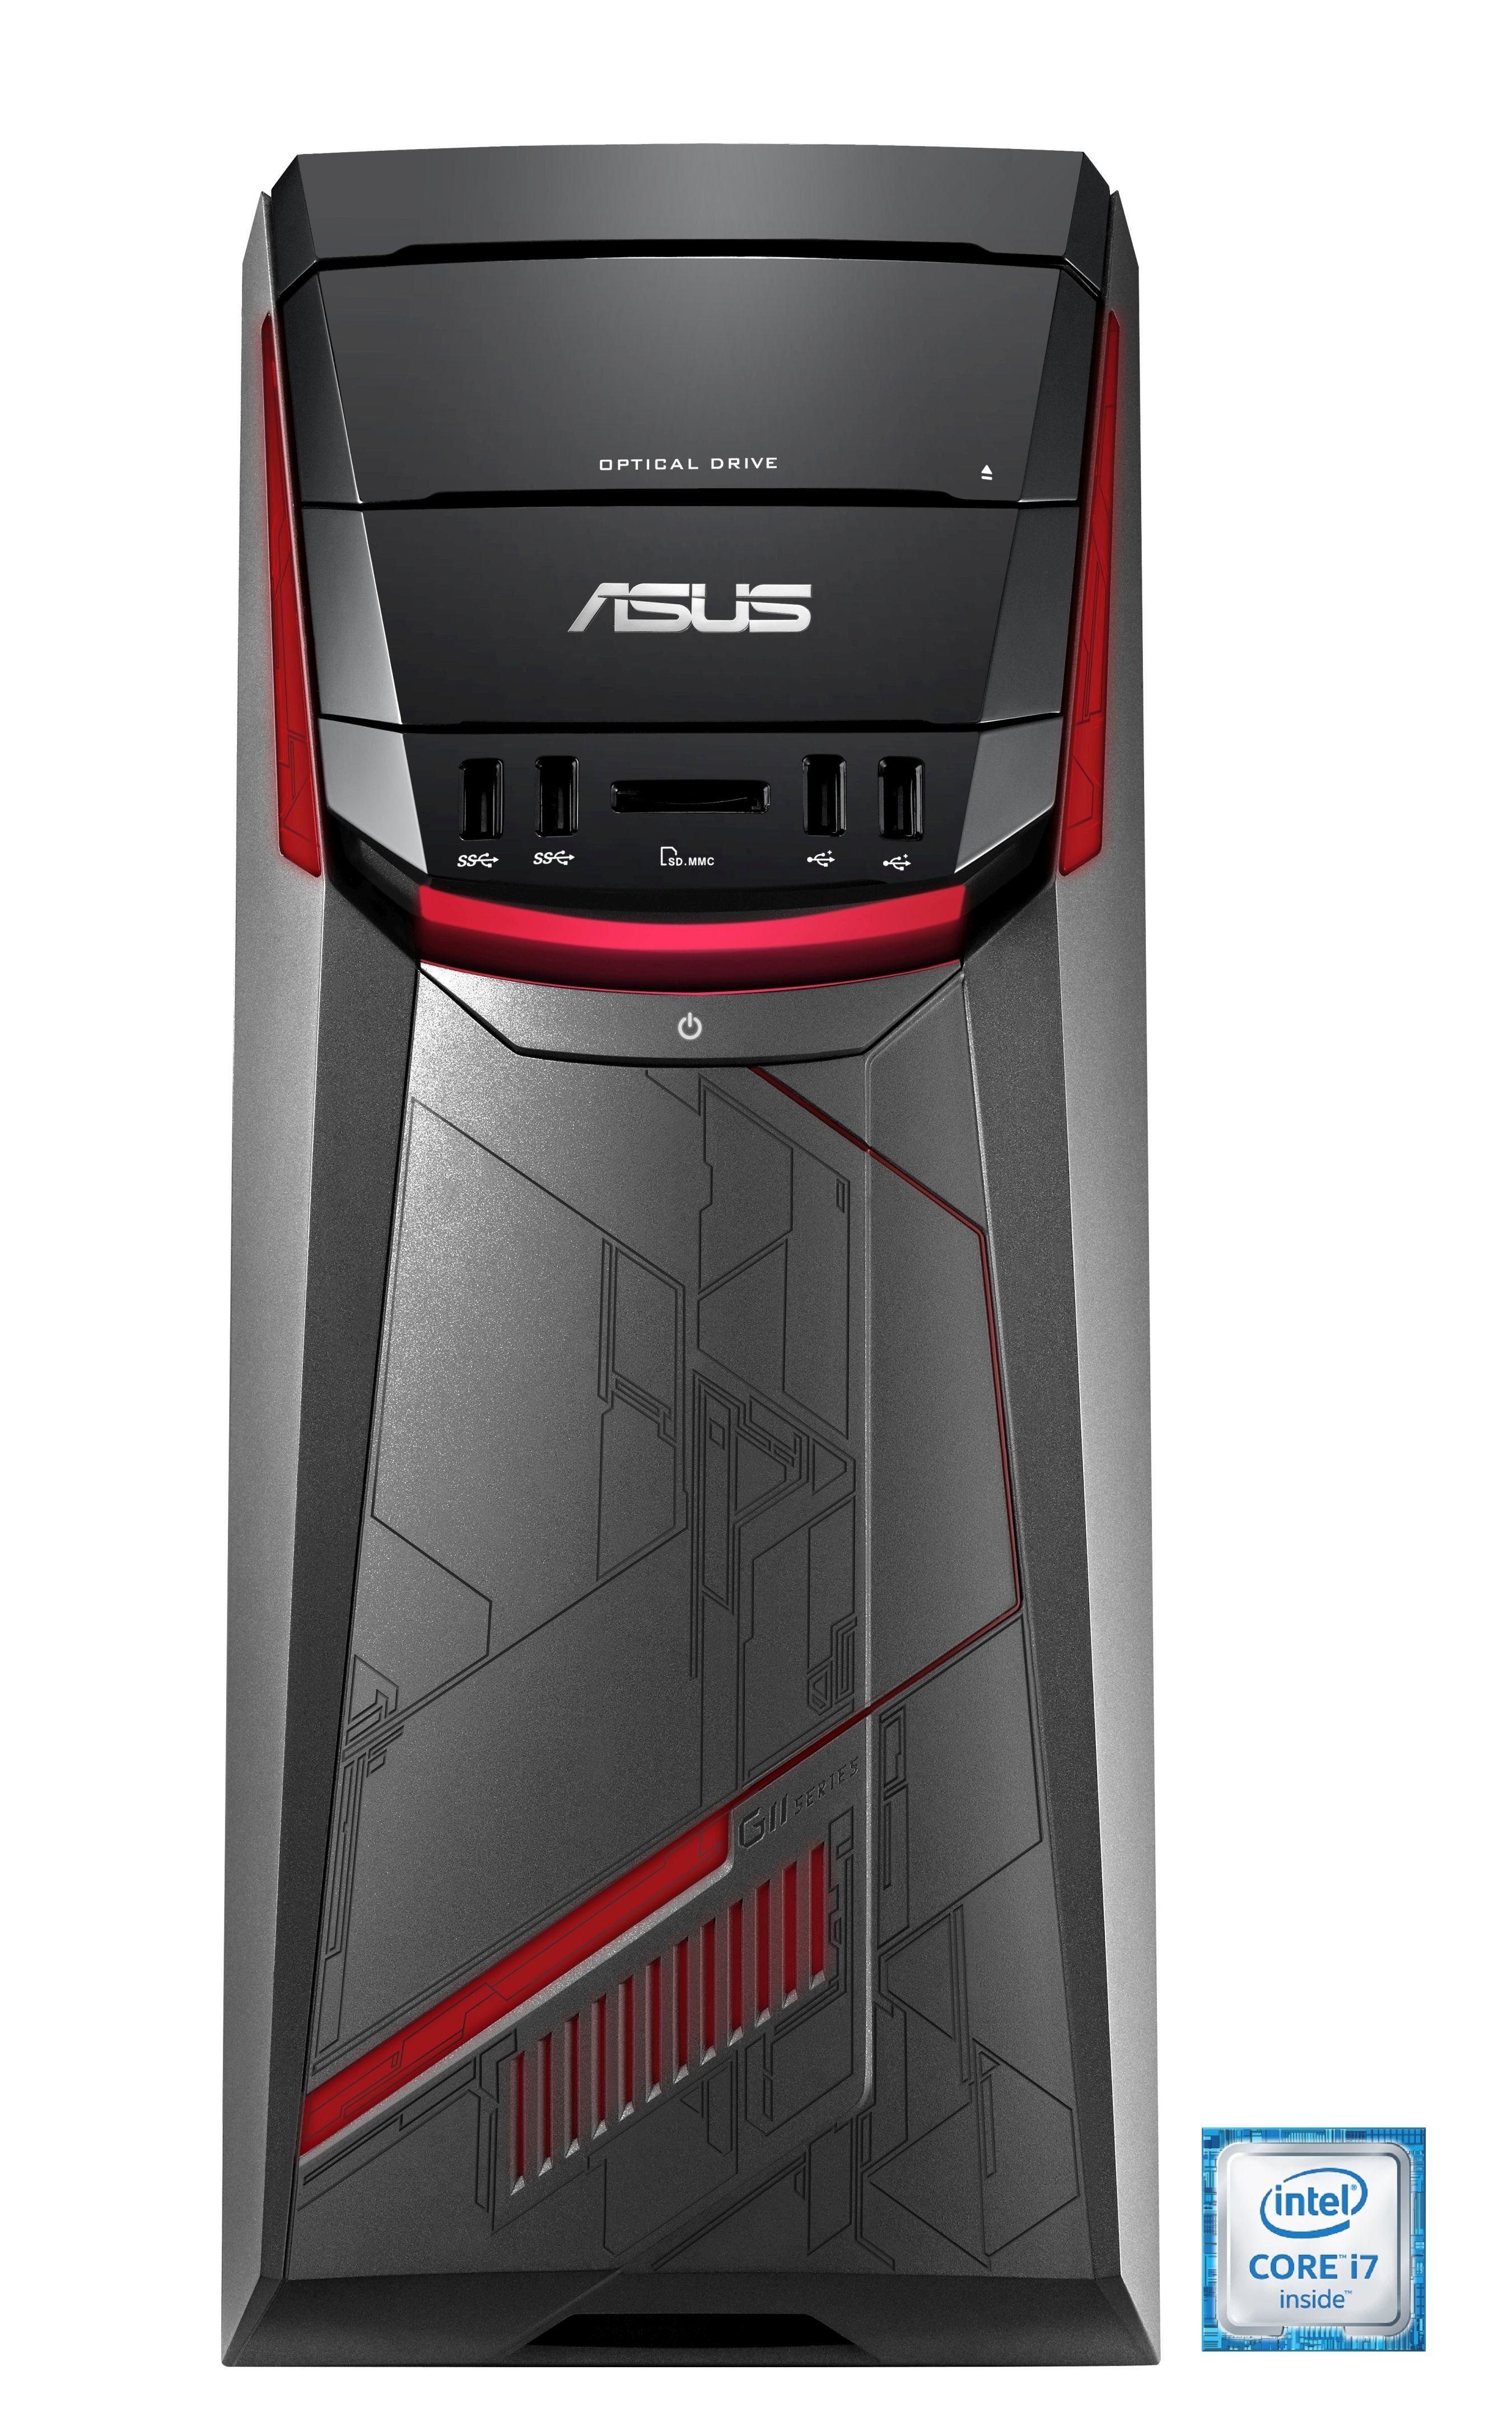 ASUS G11CB-DE026T ROG Gaming-PC »Intel Core i7, GTX 1070, 256GB + 1TB, 16 GB«